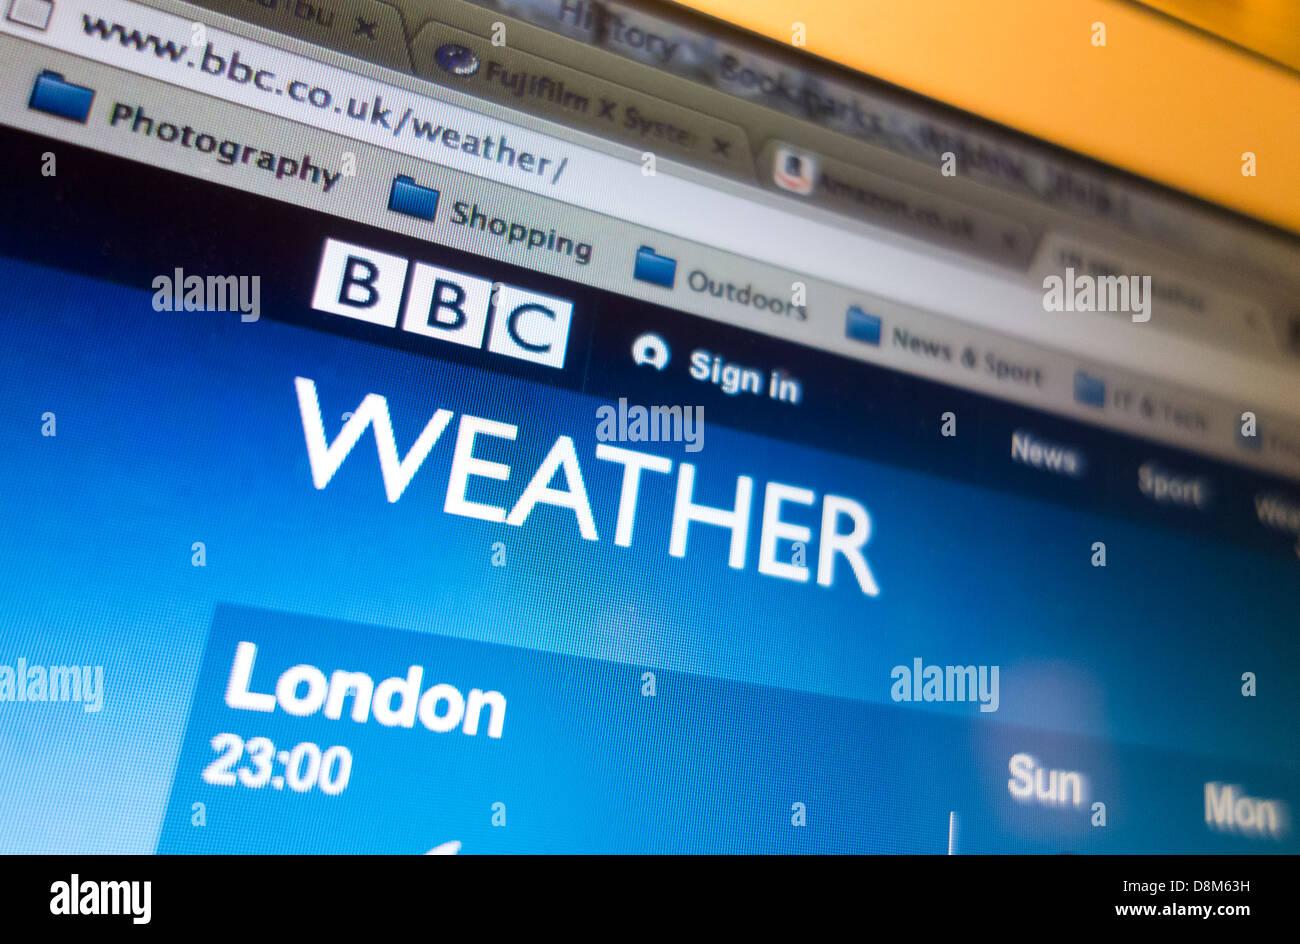 BBC Weather Homepage - Stock Image